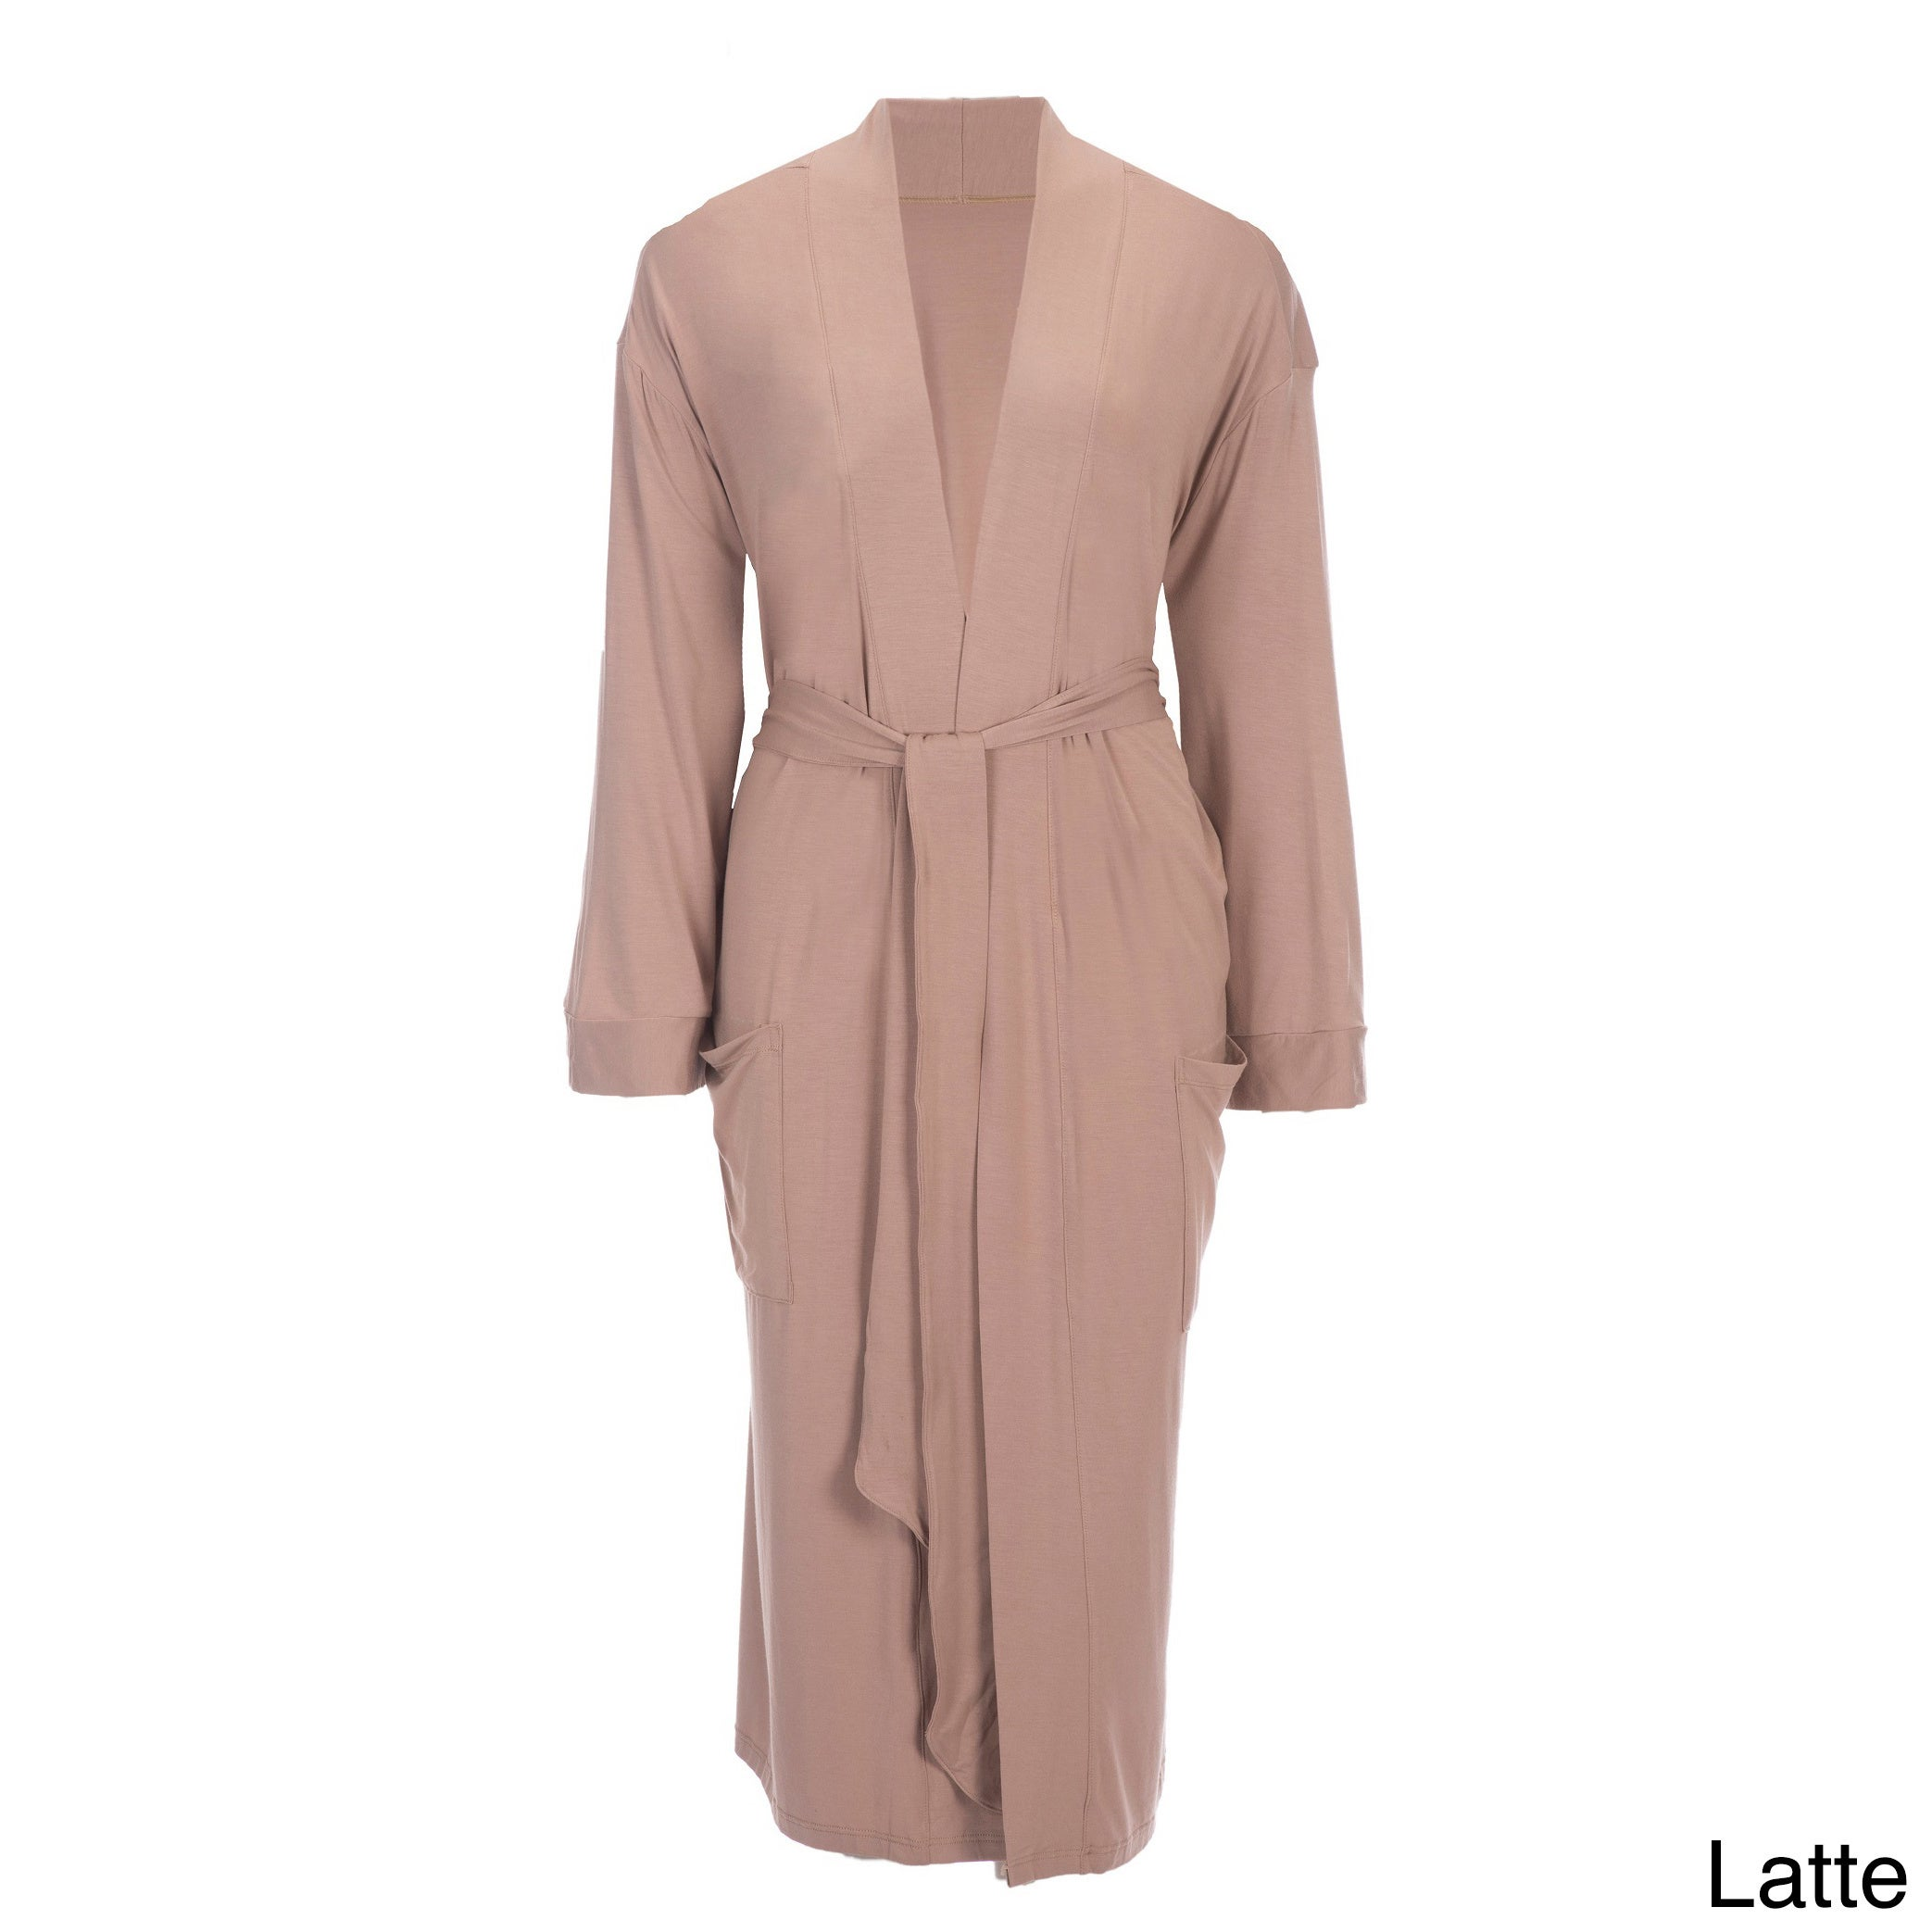 Global Rayon from Bamboo Viscose Robe (Latte S/M), Women'...